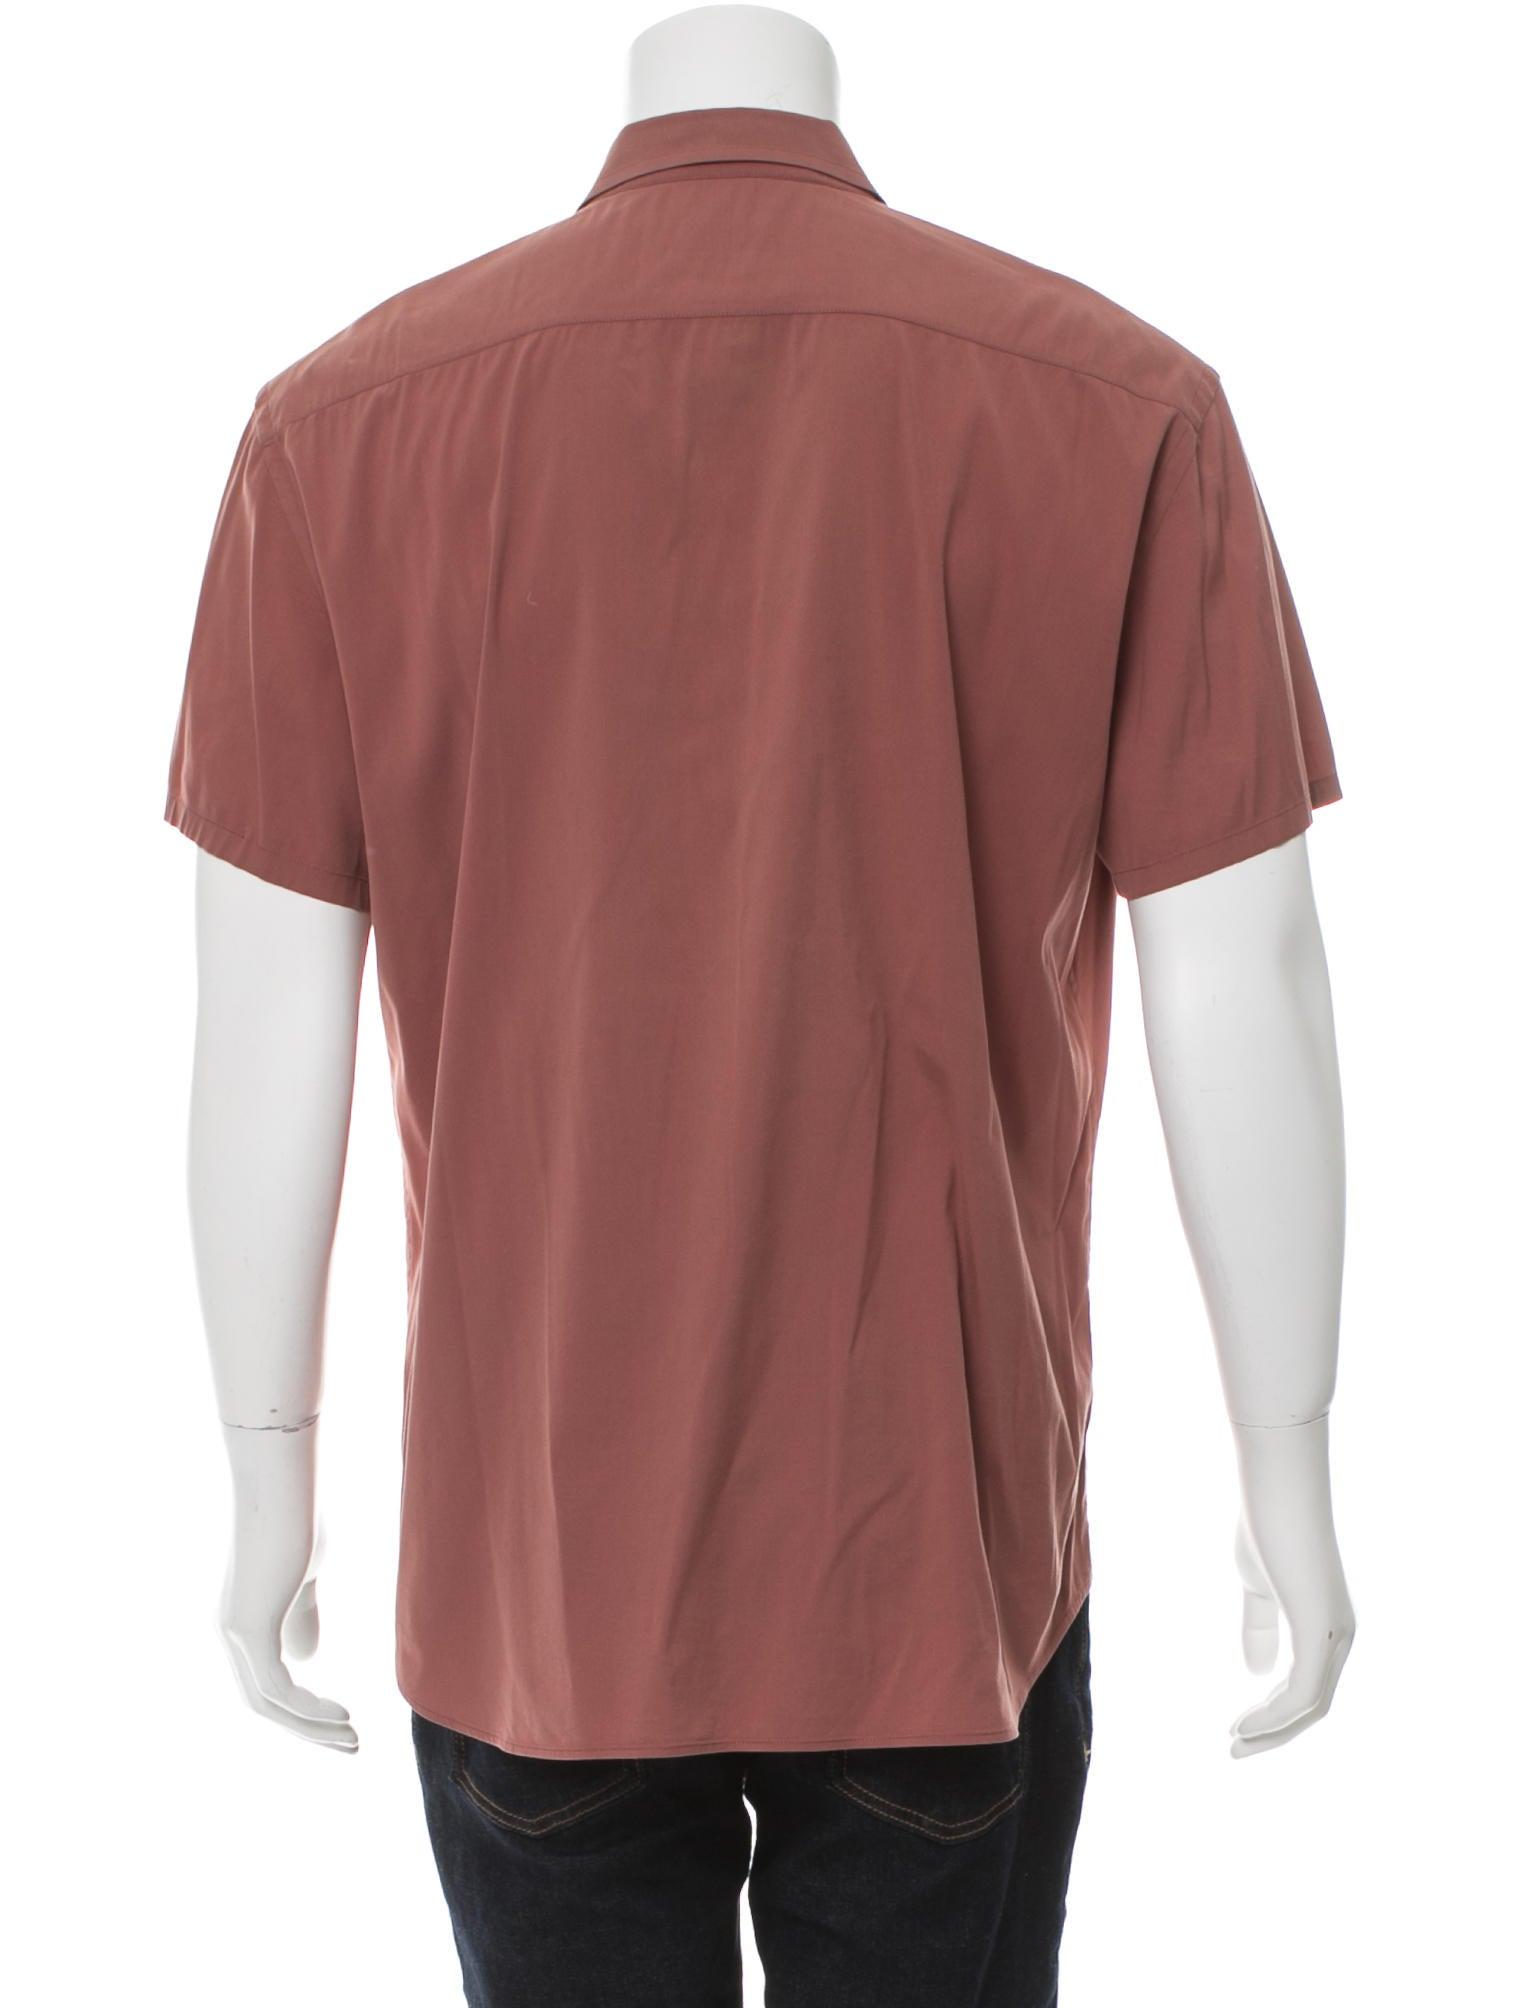 Prada Short Sleeve Button Up Shirt Clothing Pra159443